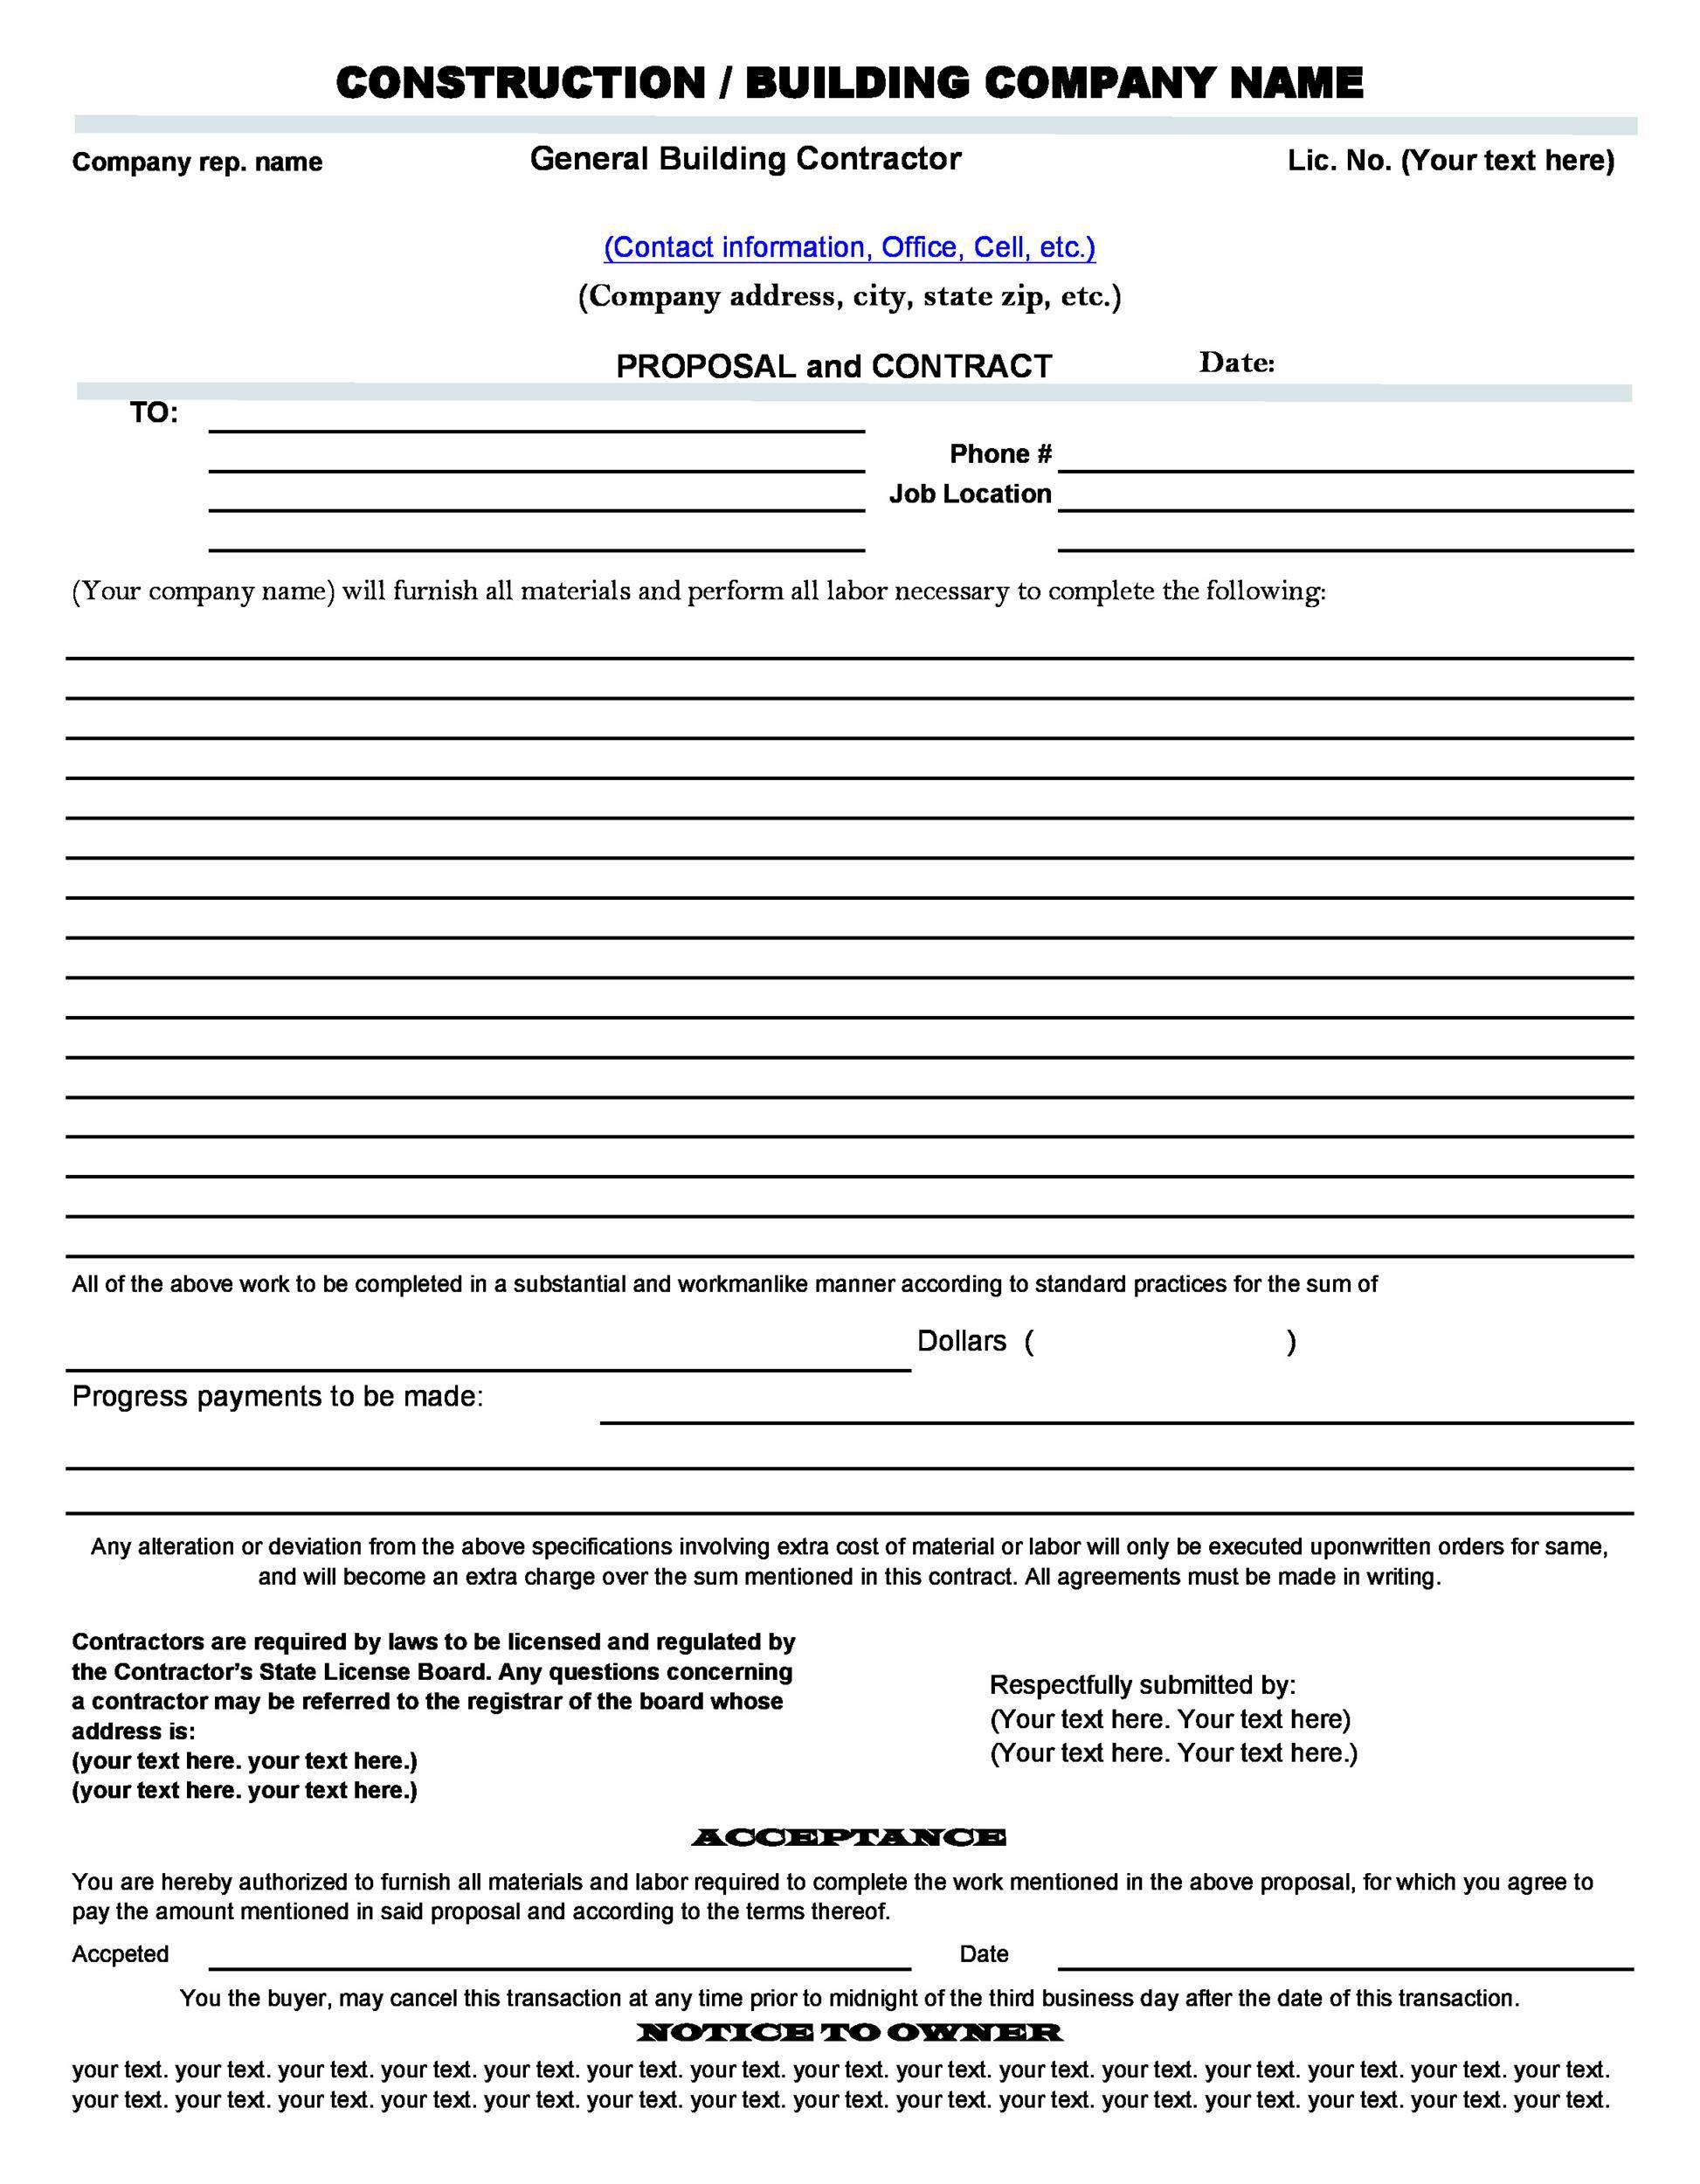 005 Best Free Construction Proposal Template Example  Bid Contractor WordFull